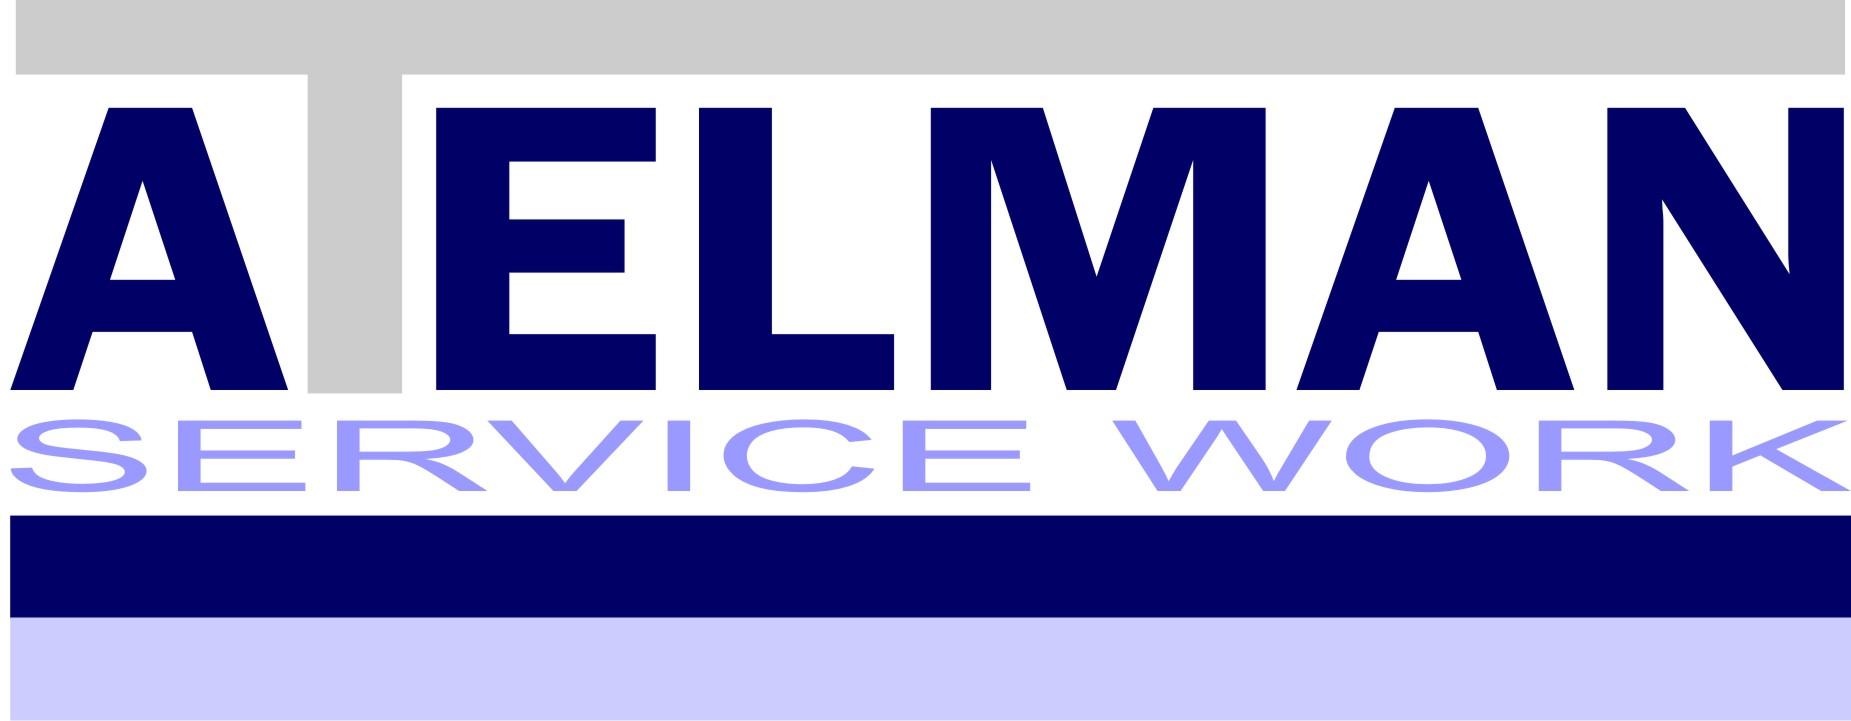 Atelman Service Work